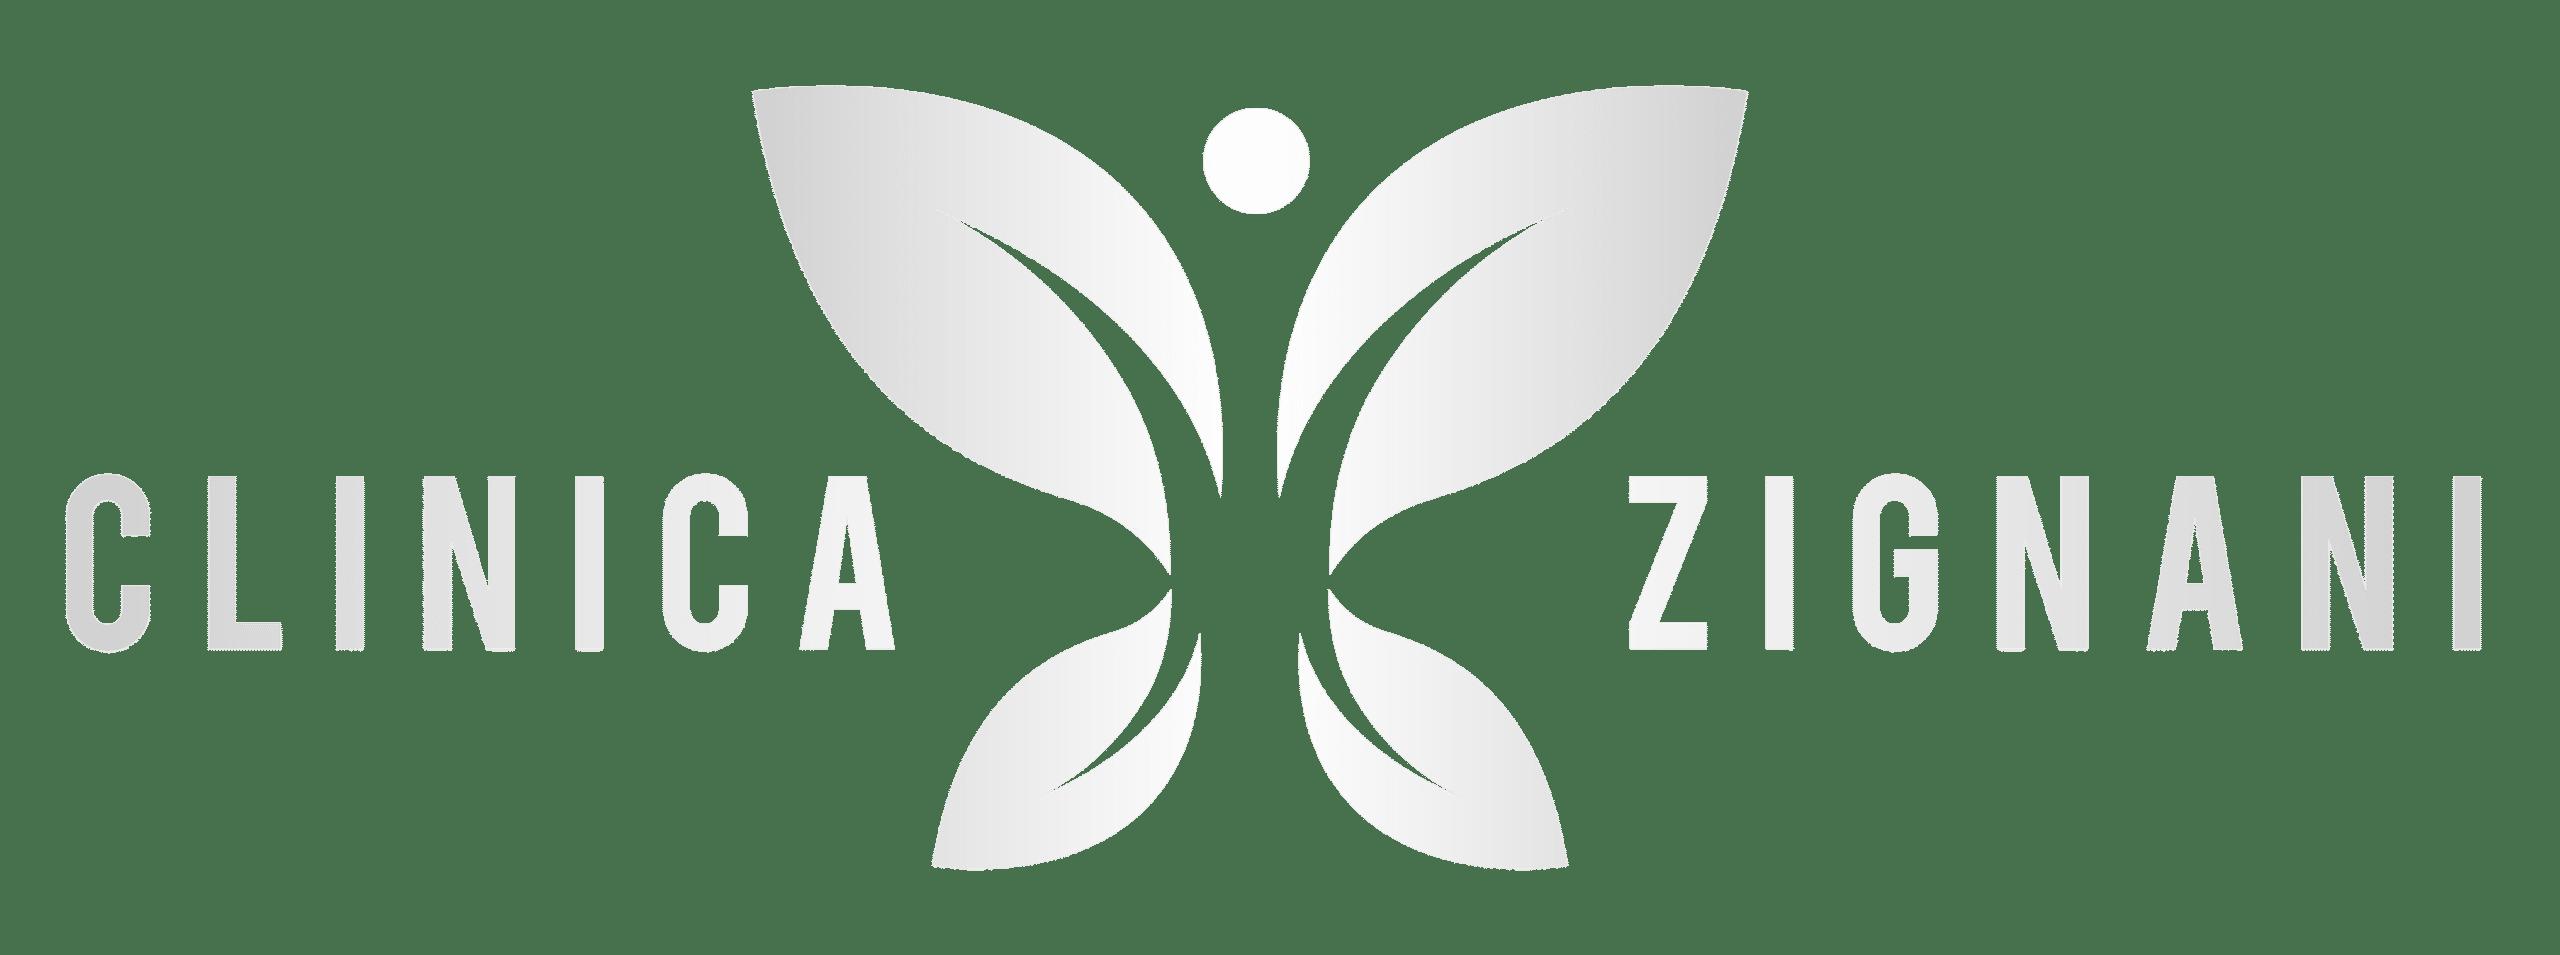 Clinica Zignani